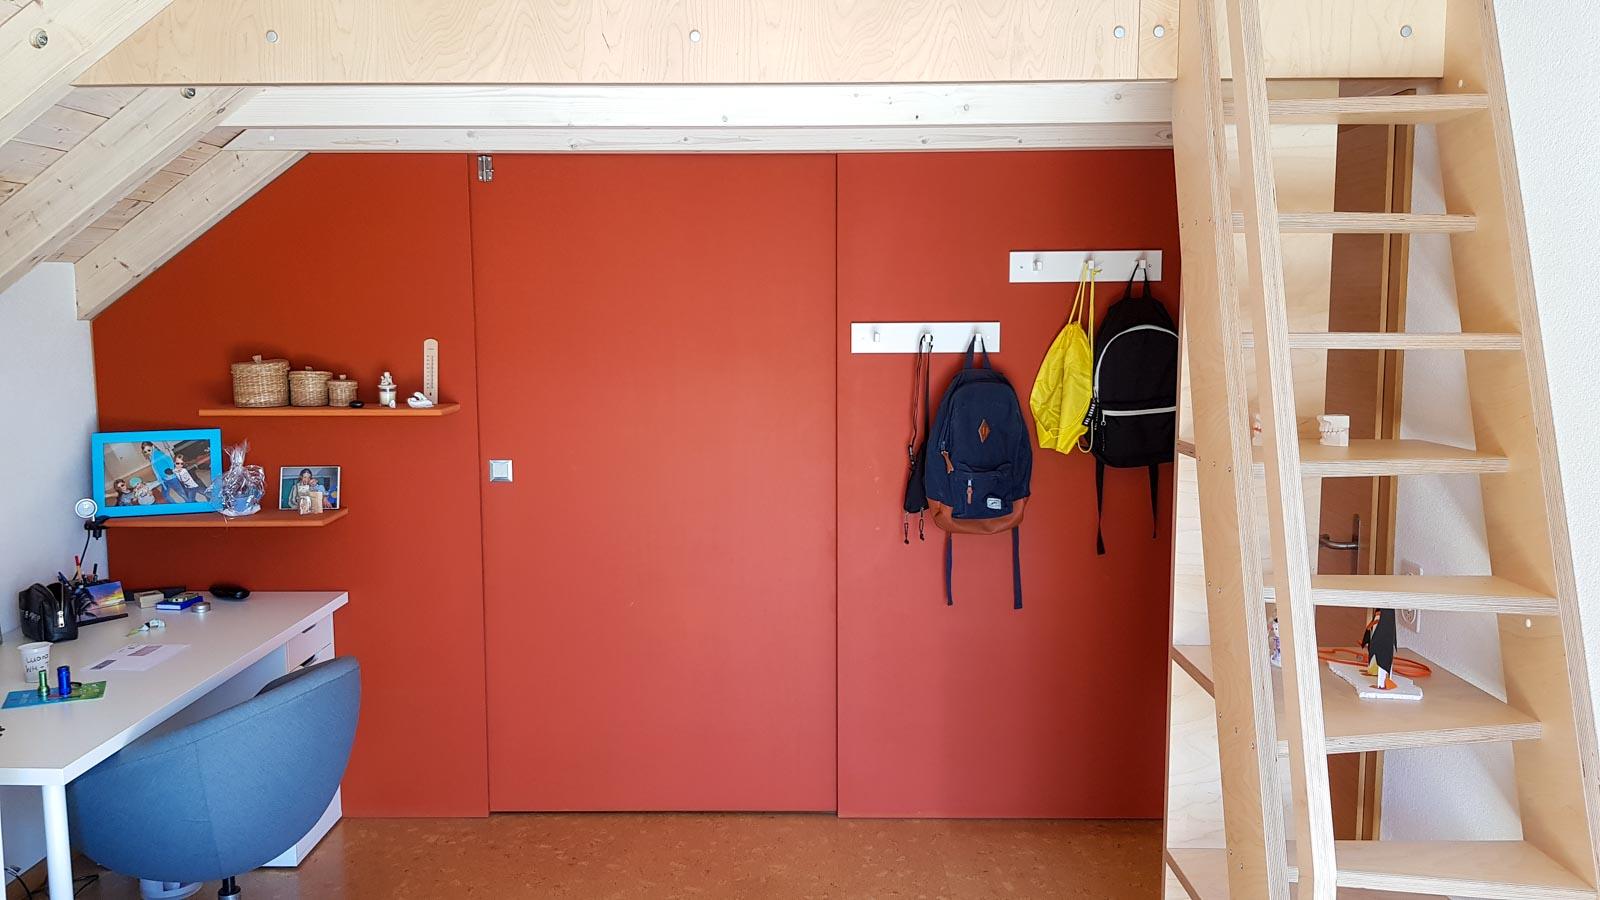 Wooddesign_Jugendzimmer_Jugendbett_Teppe_Schreibtisch-Verstauraum_Hochbbett_Ankleide_Schubladen_Pinwand_Bücherregal (1)